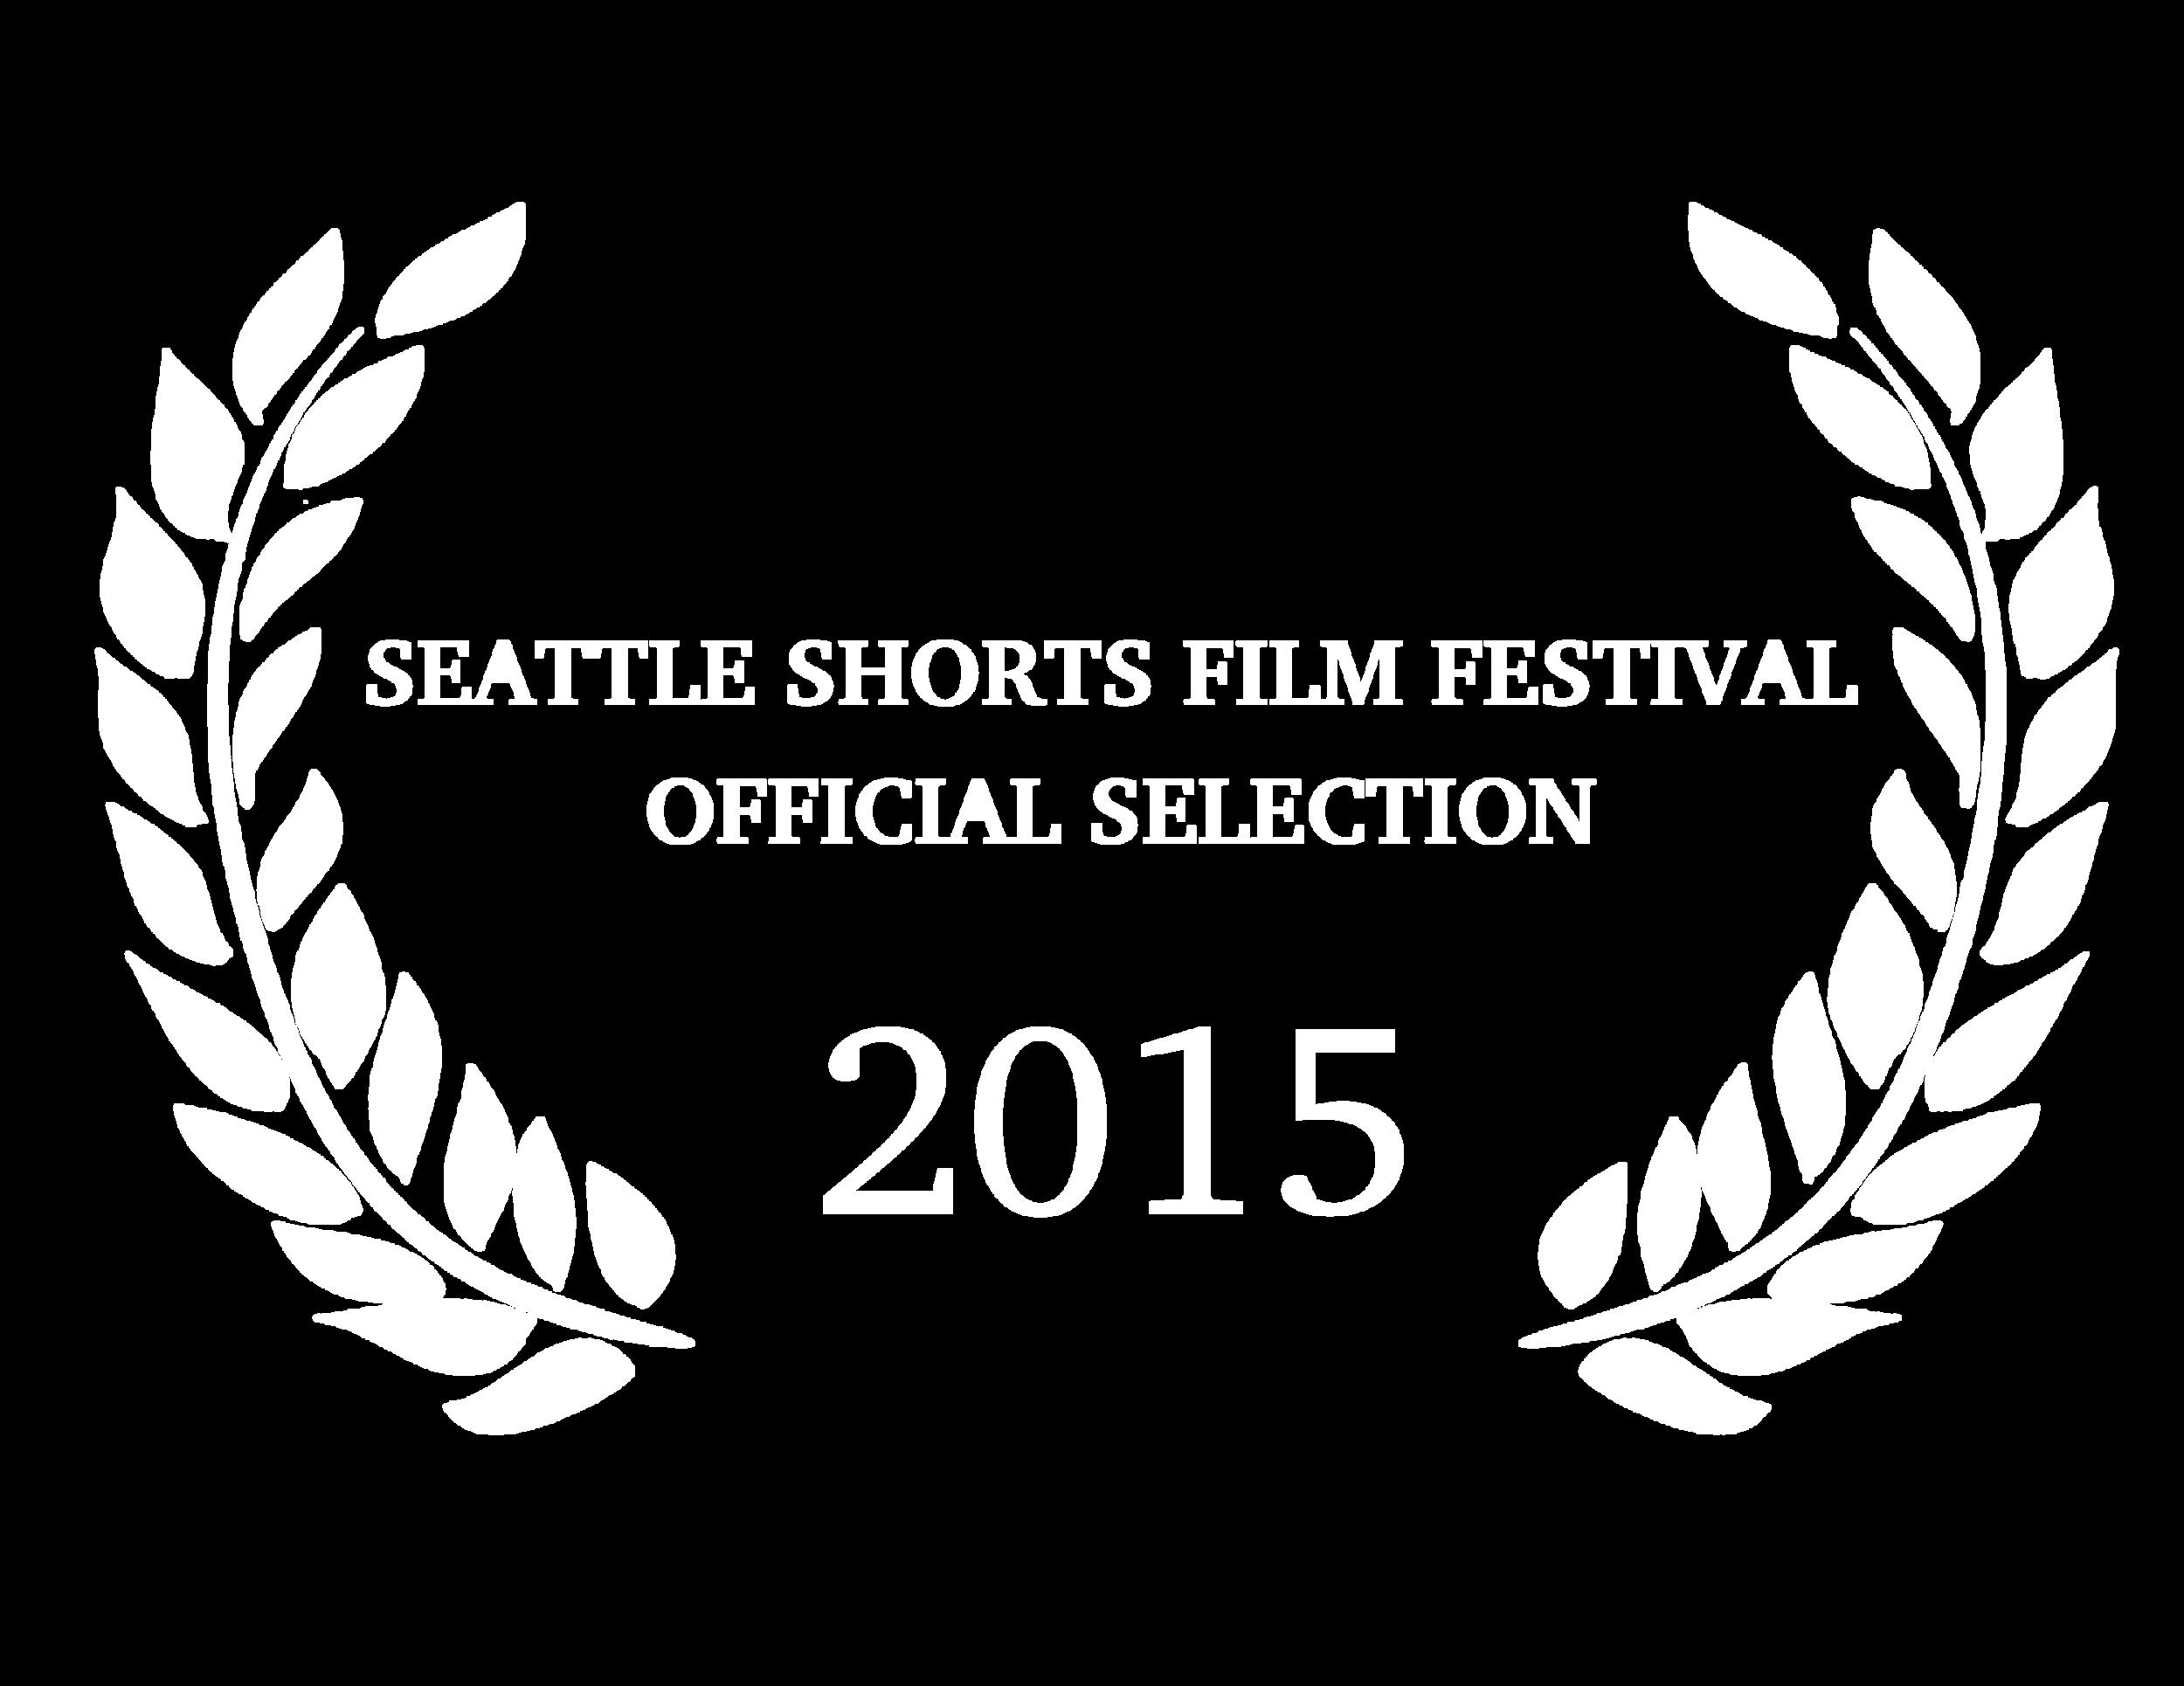 Seattle Shorts Laruels 20153.png